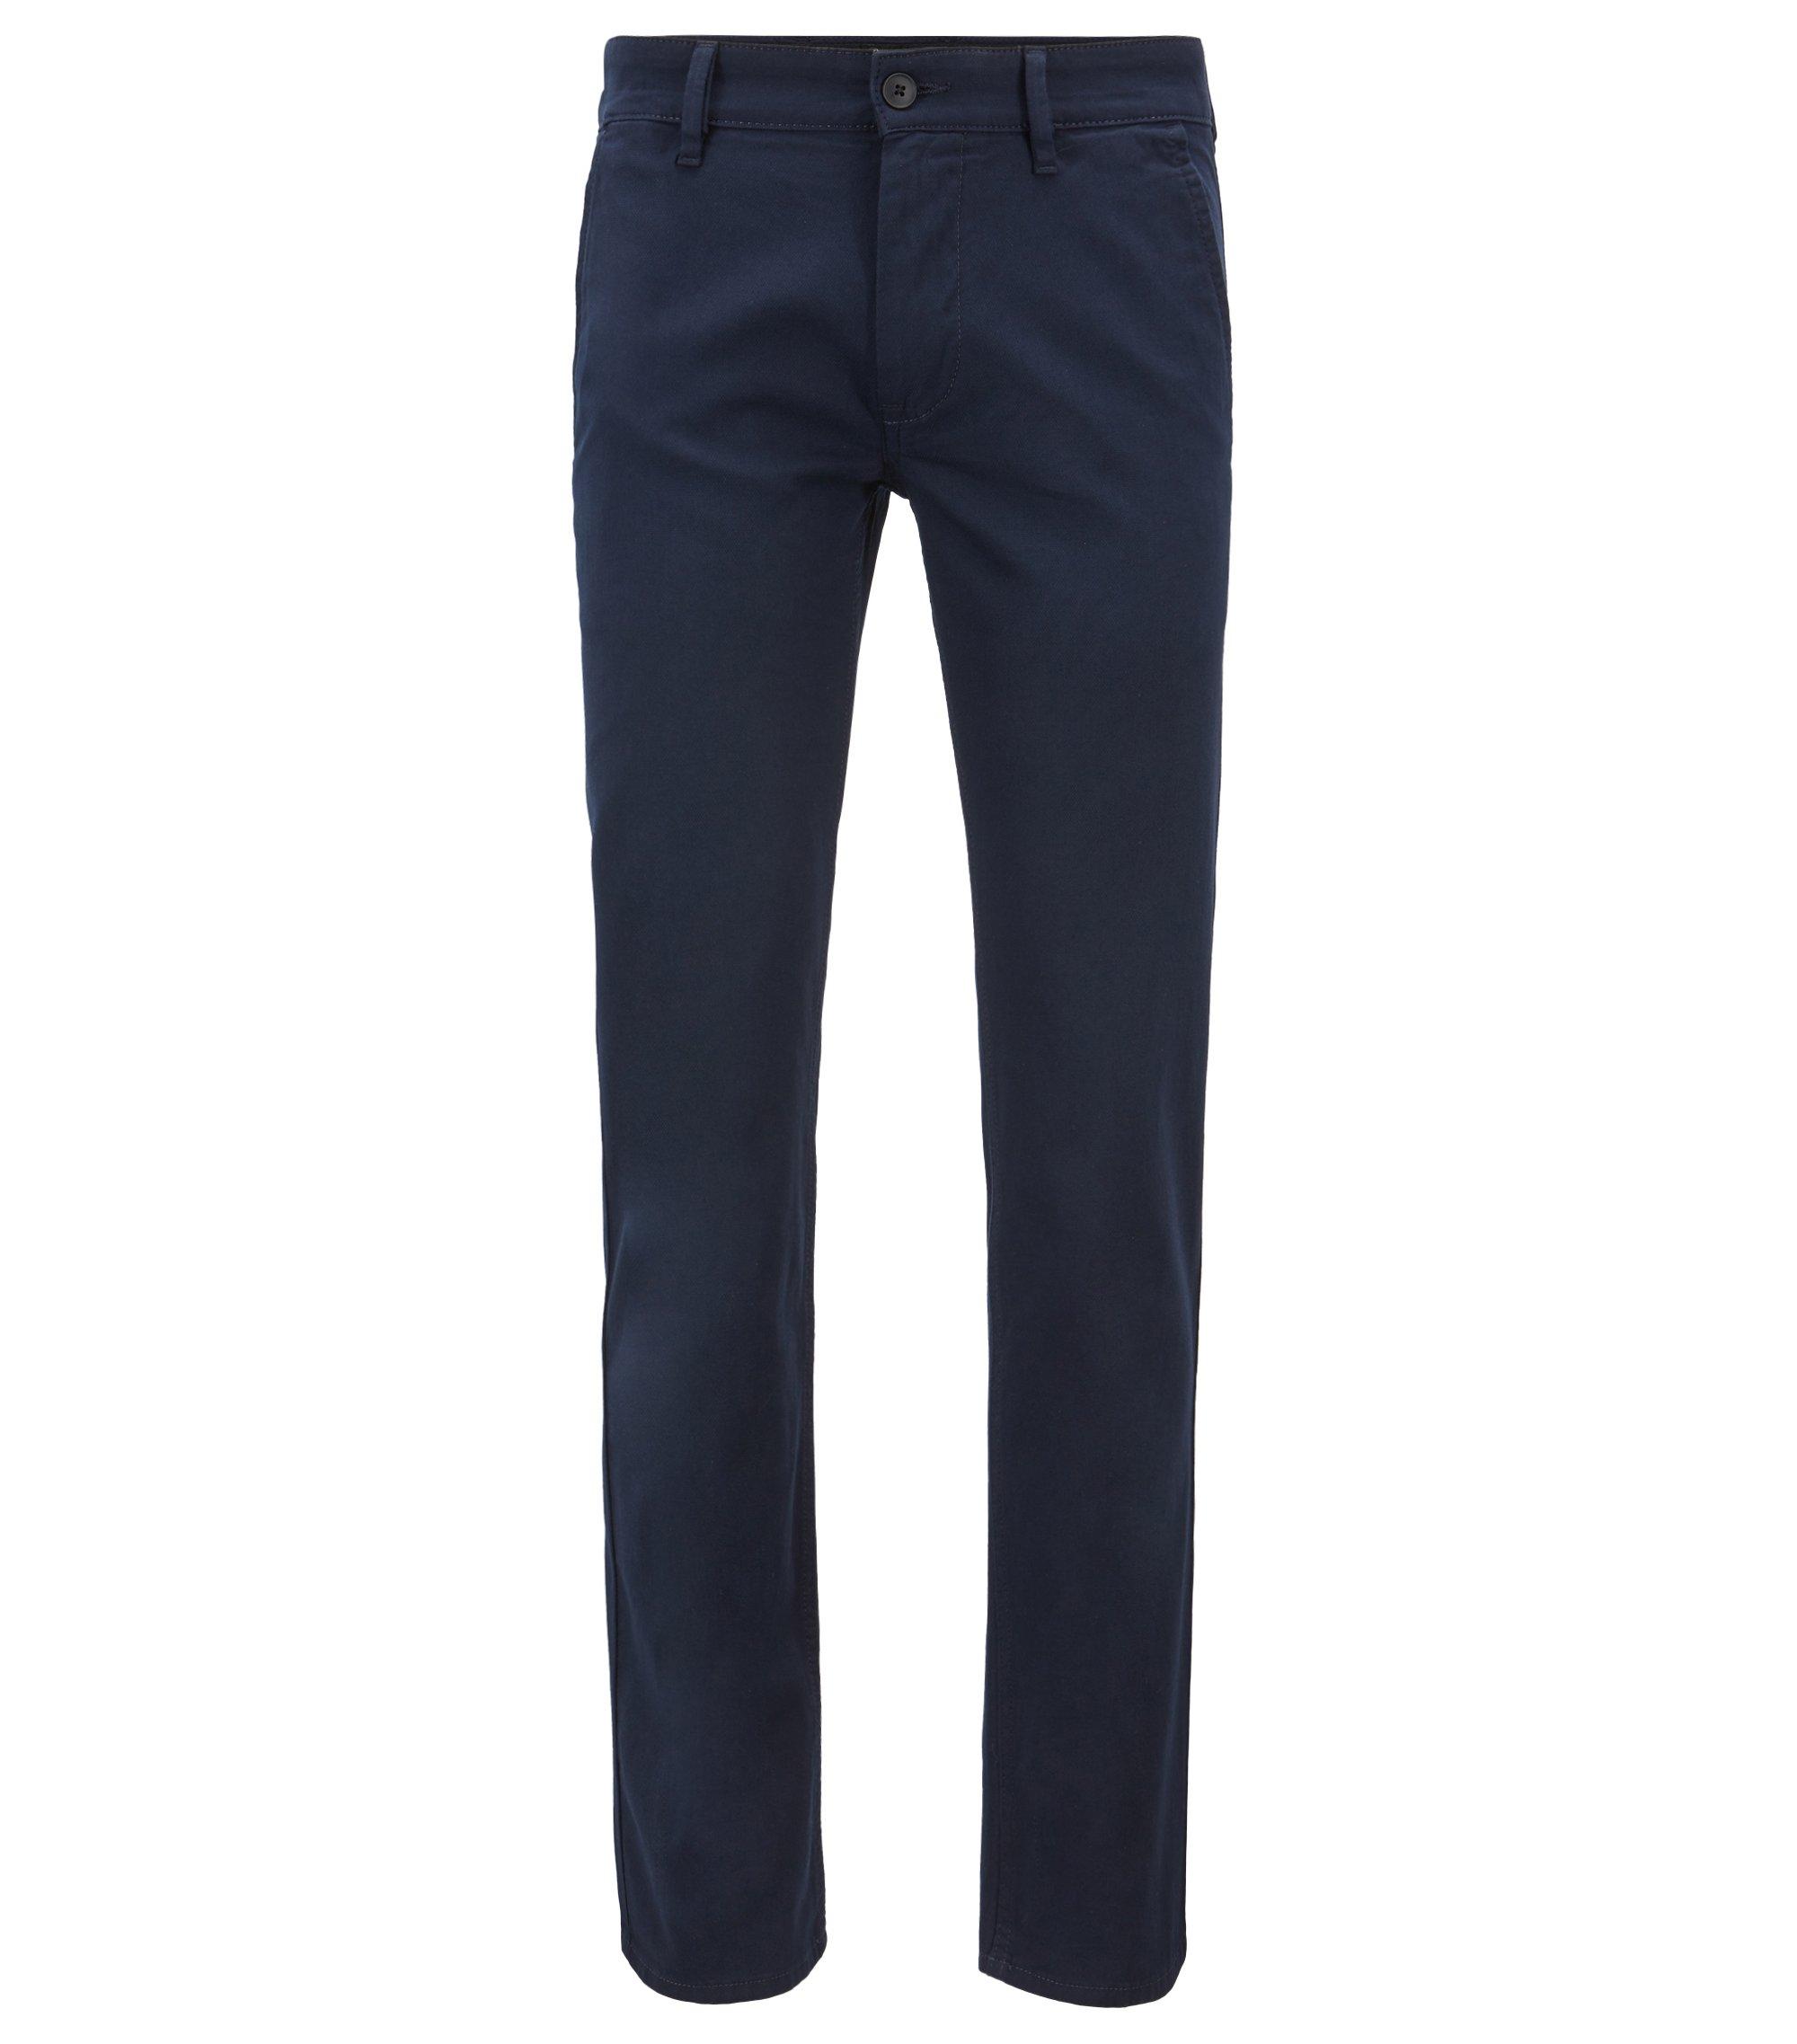 Pantaloni slim fit sovratinti con doppi passanti, Blu scuro